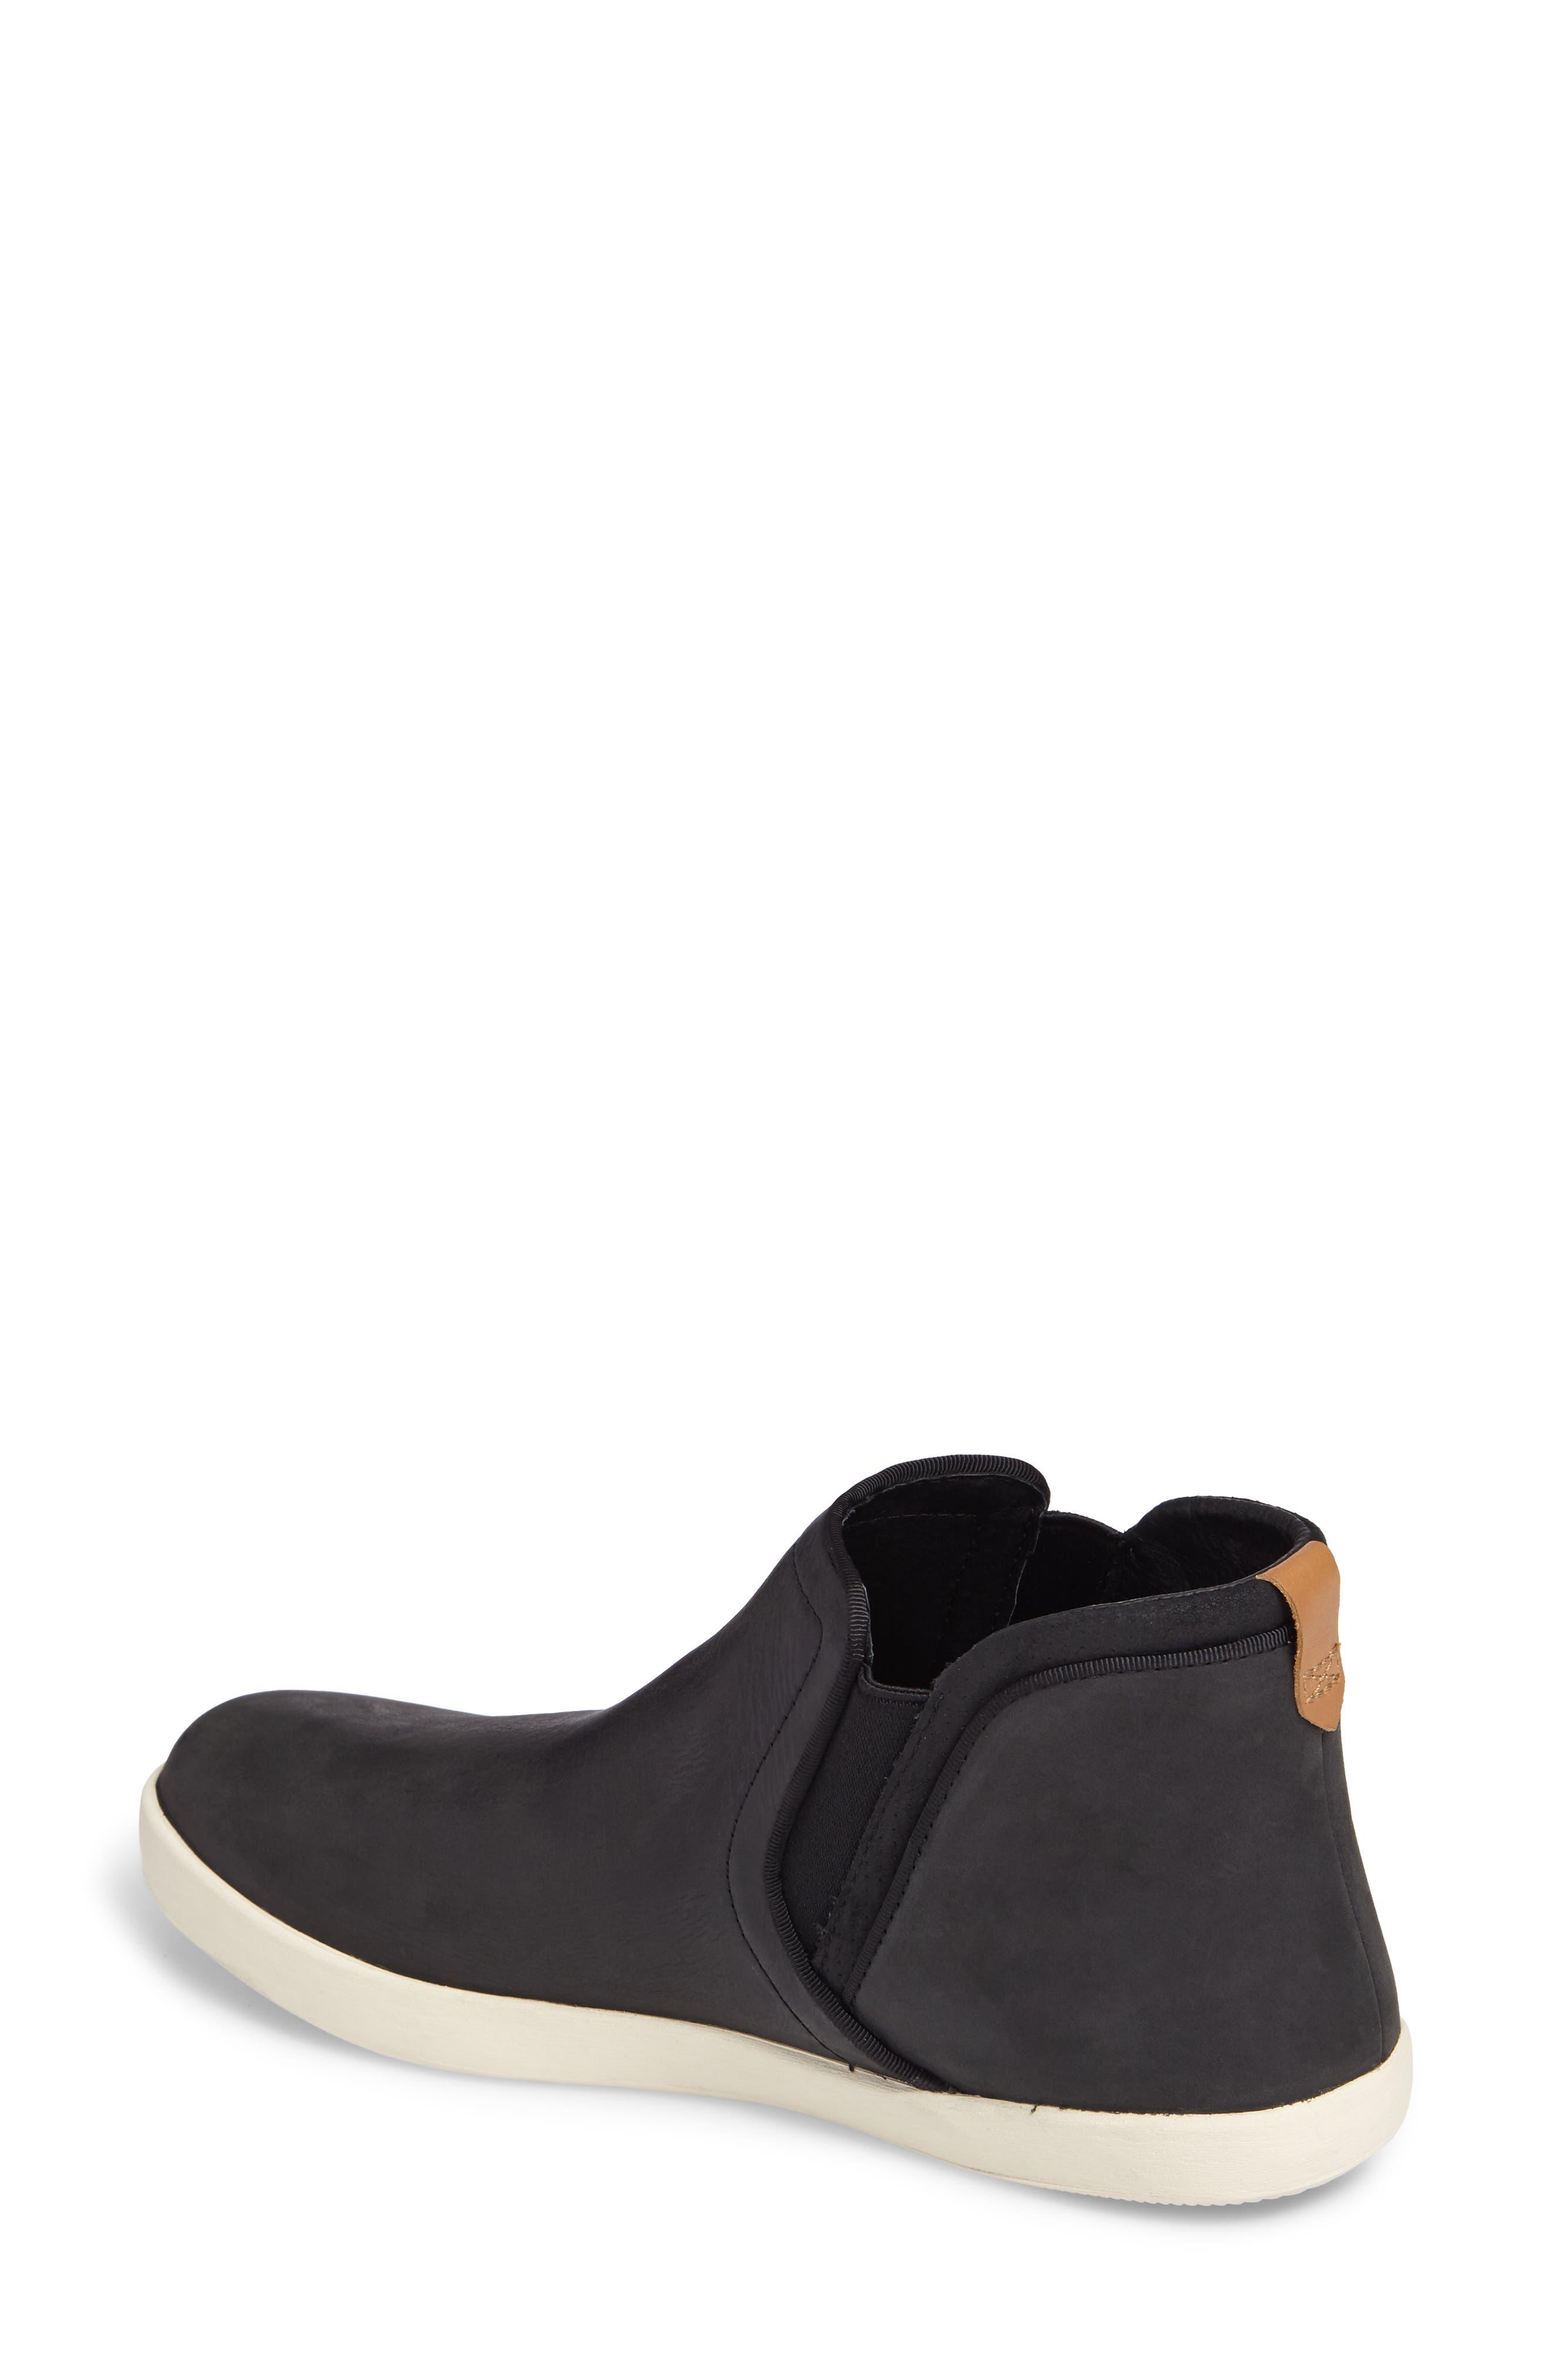 Willow Chelsea Sneaker,                             Alternate thumbnail 2, color,                             Black Leather